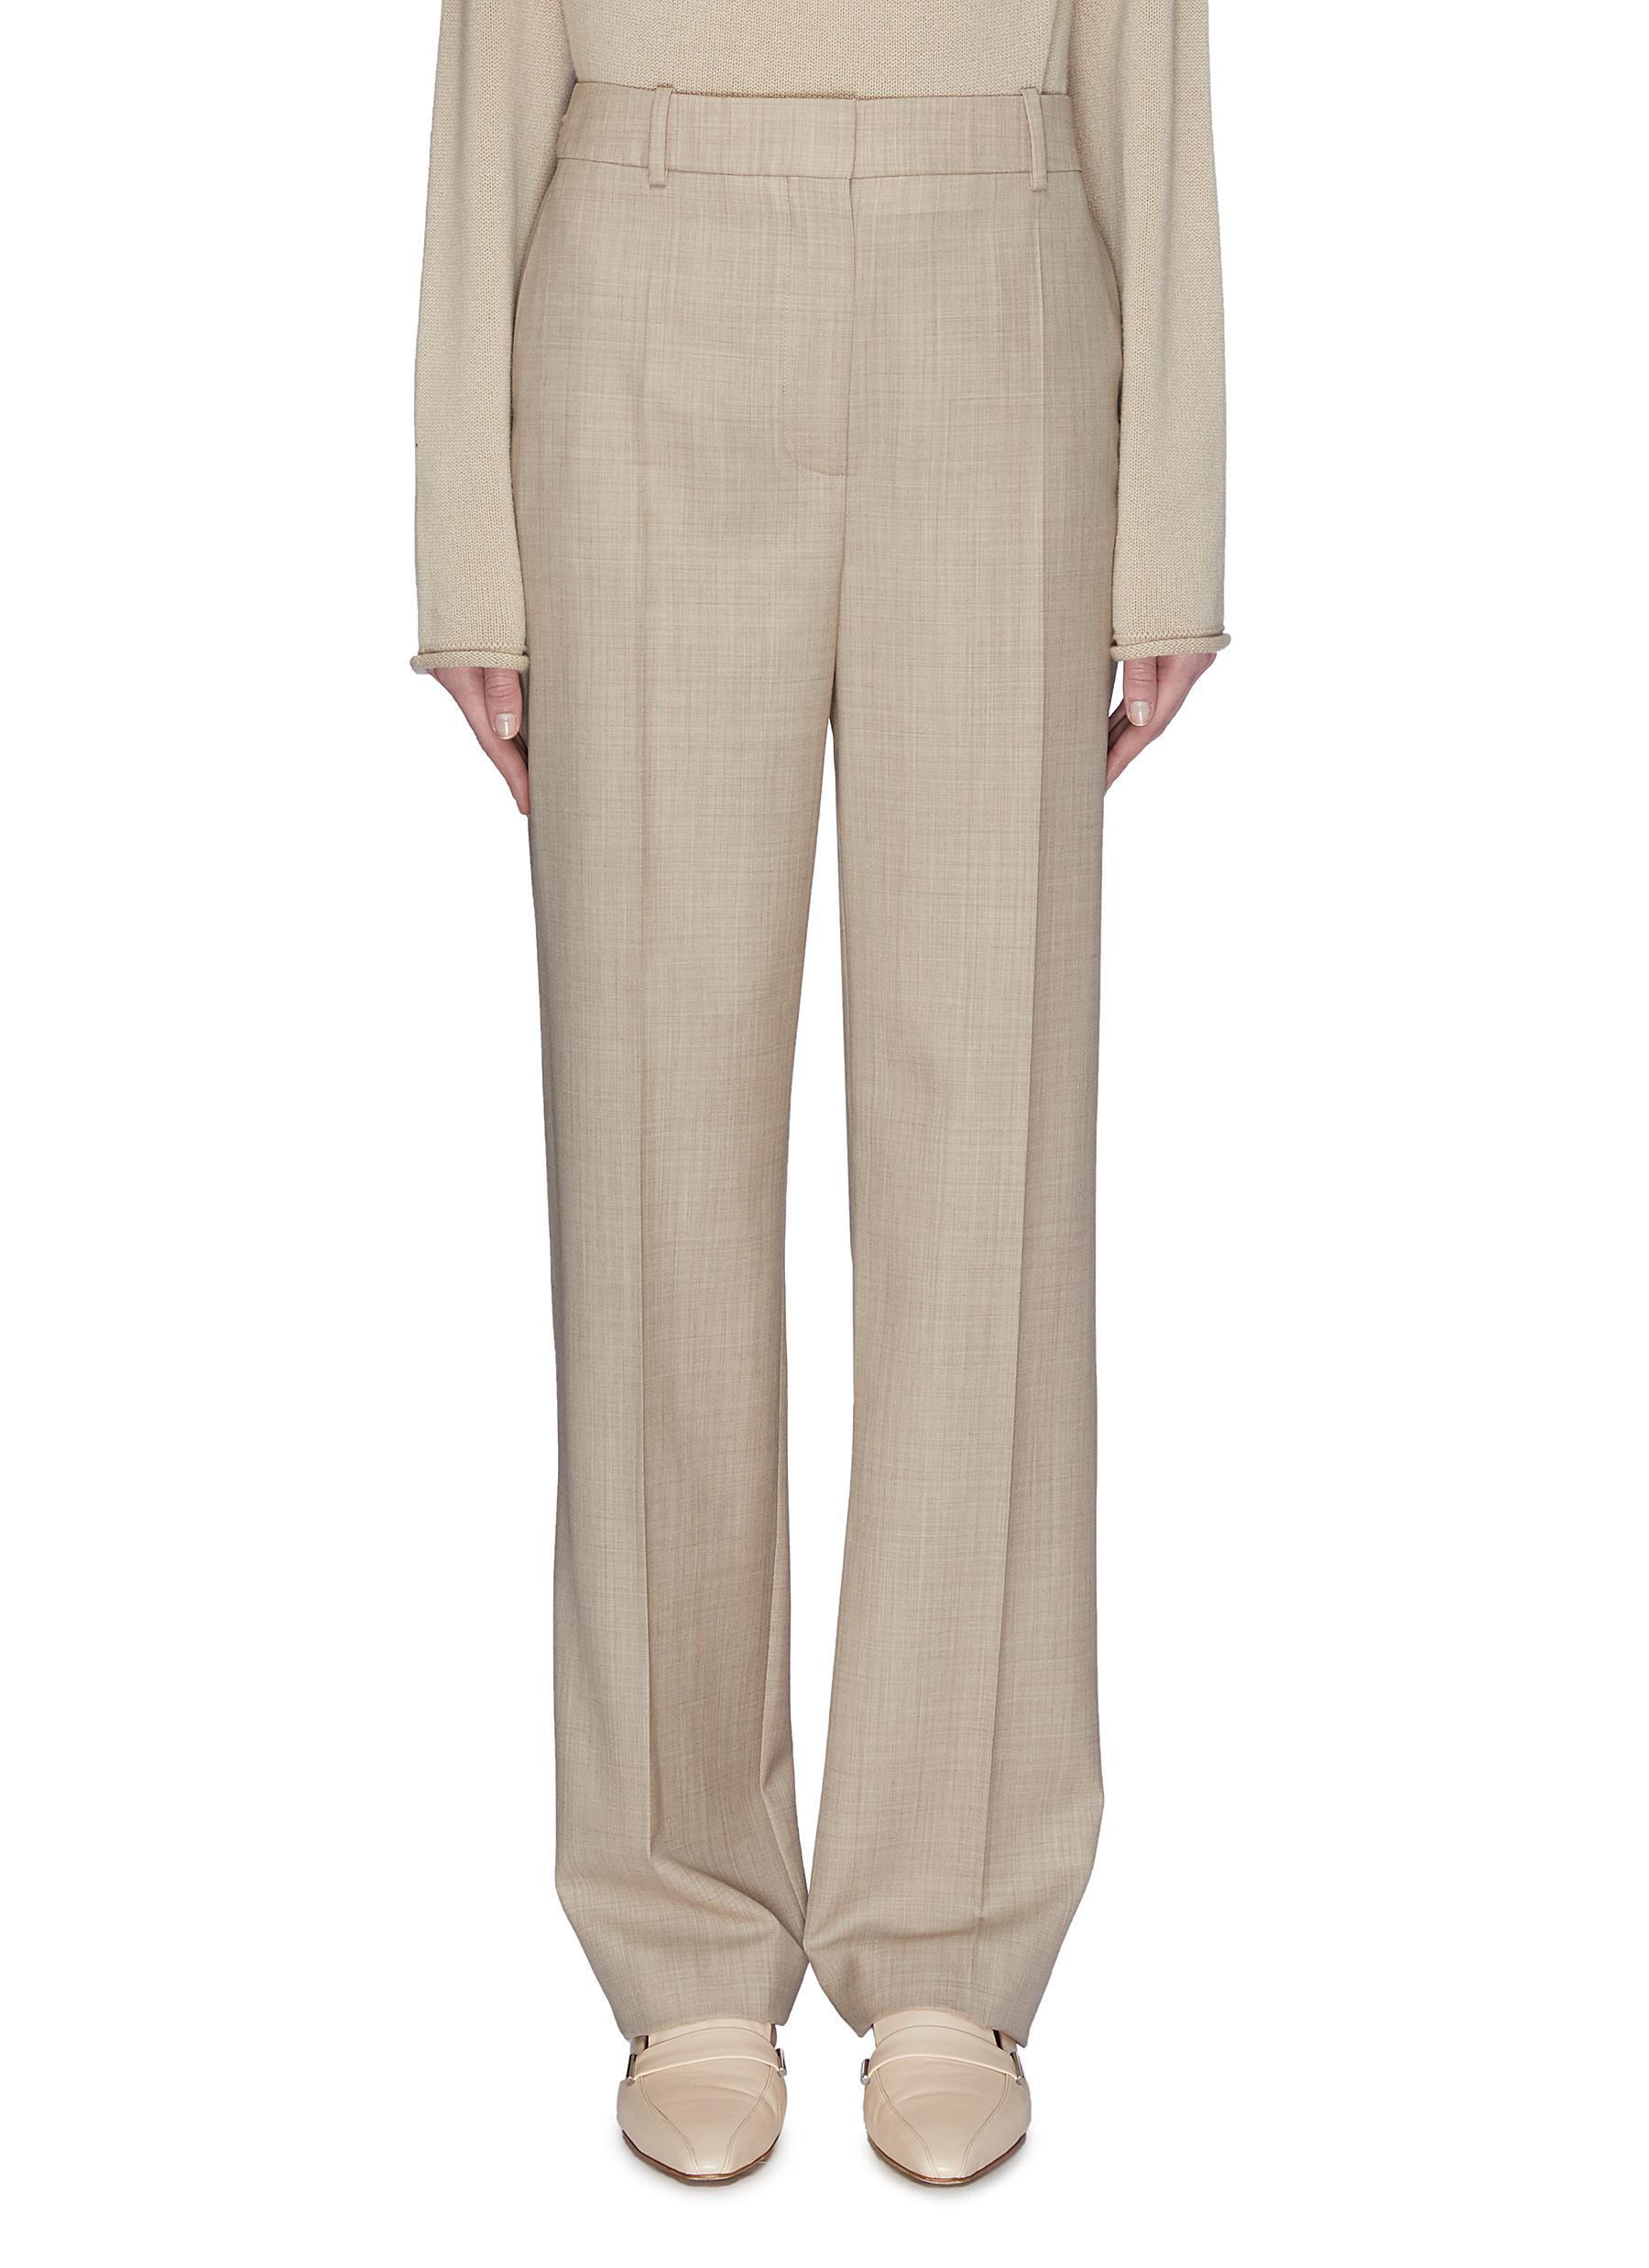 Buy Roksanda Pants & Shorts 'Livio' straight leg pants